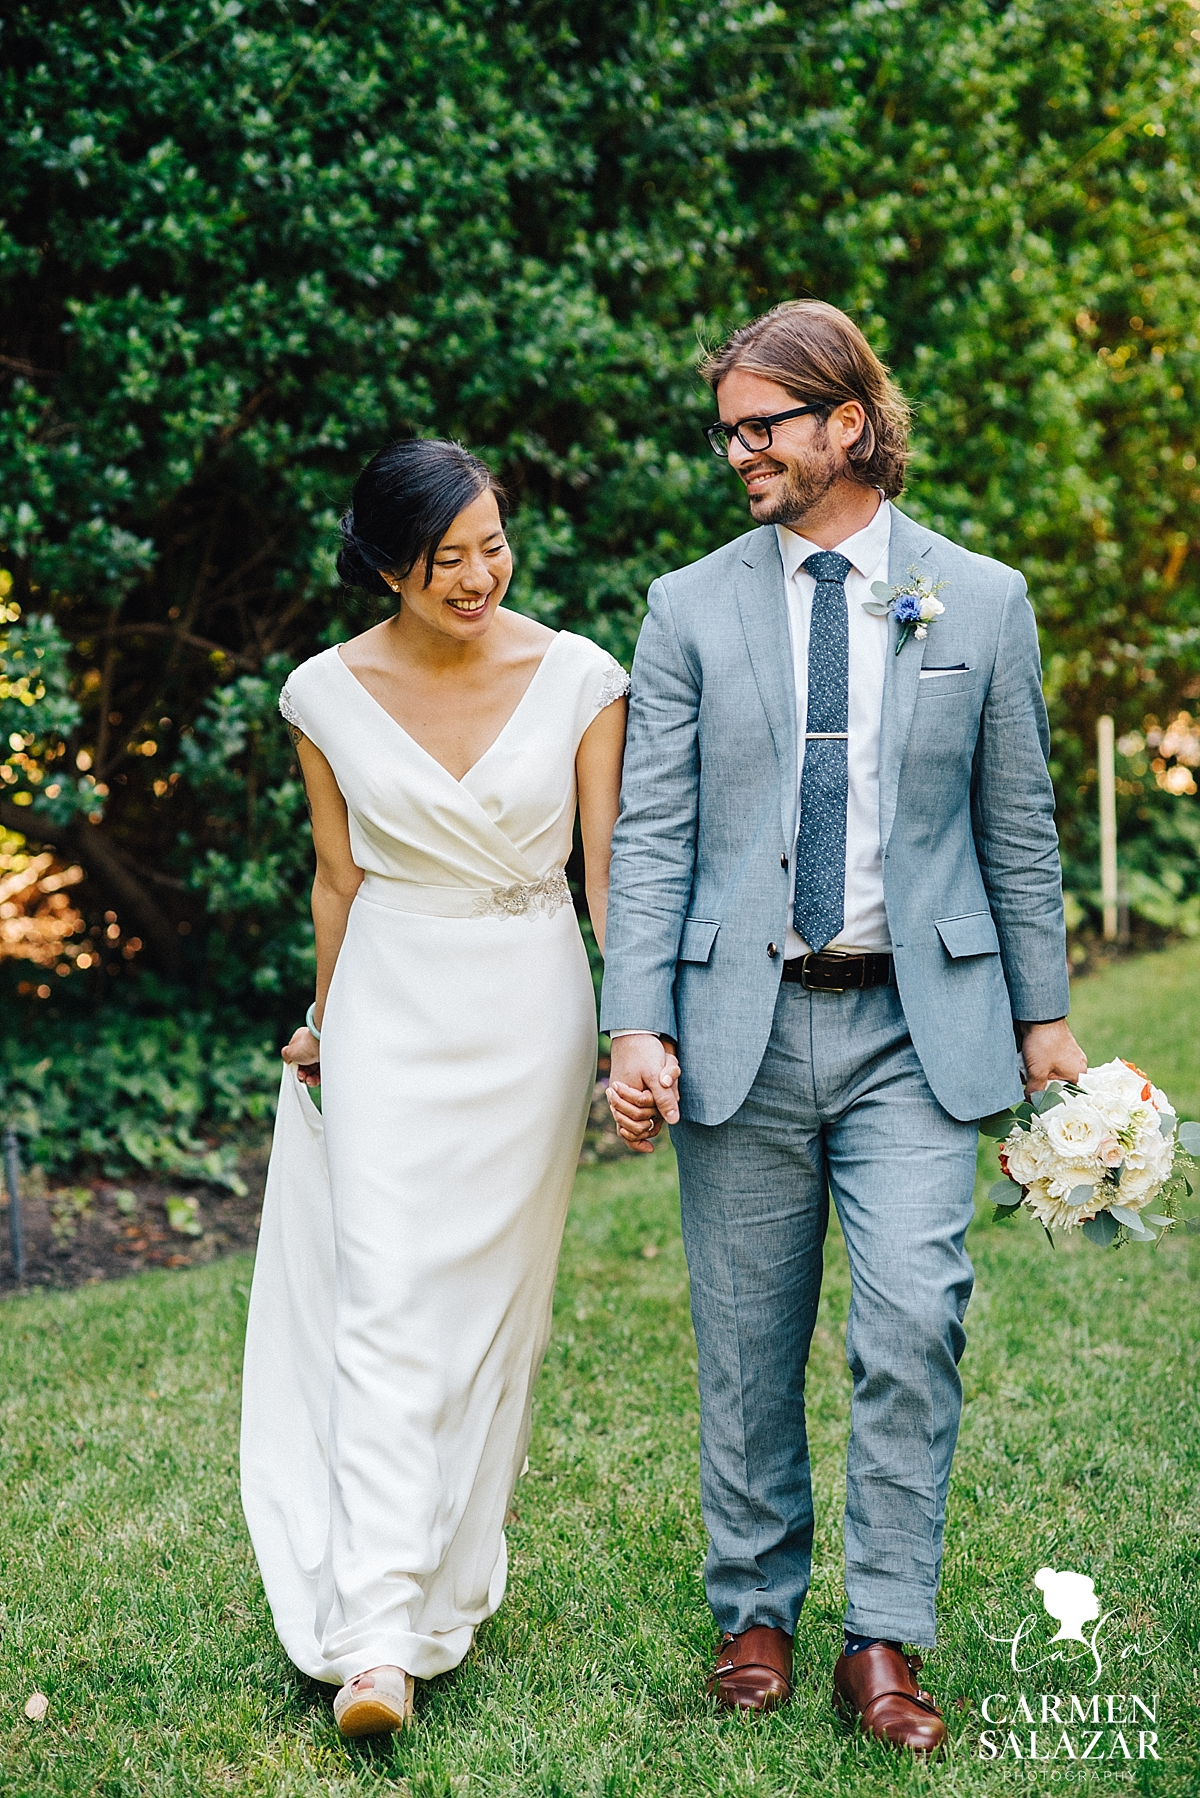 Sweet Bay area bride and groom at reception - Carmen Salazar